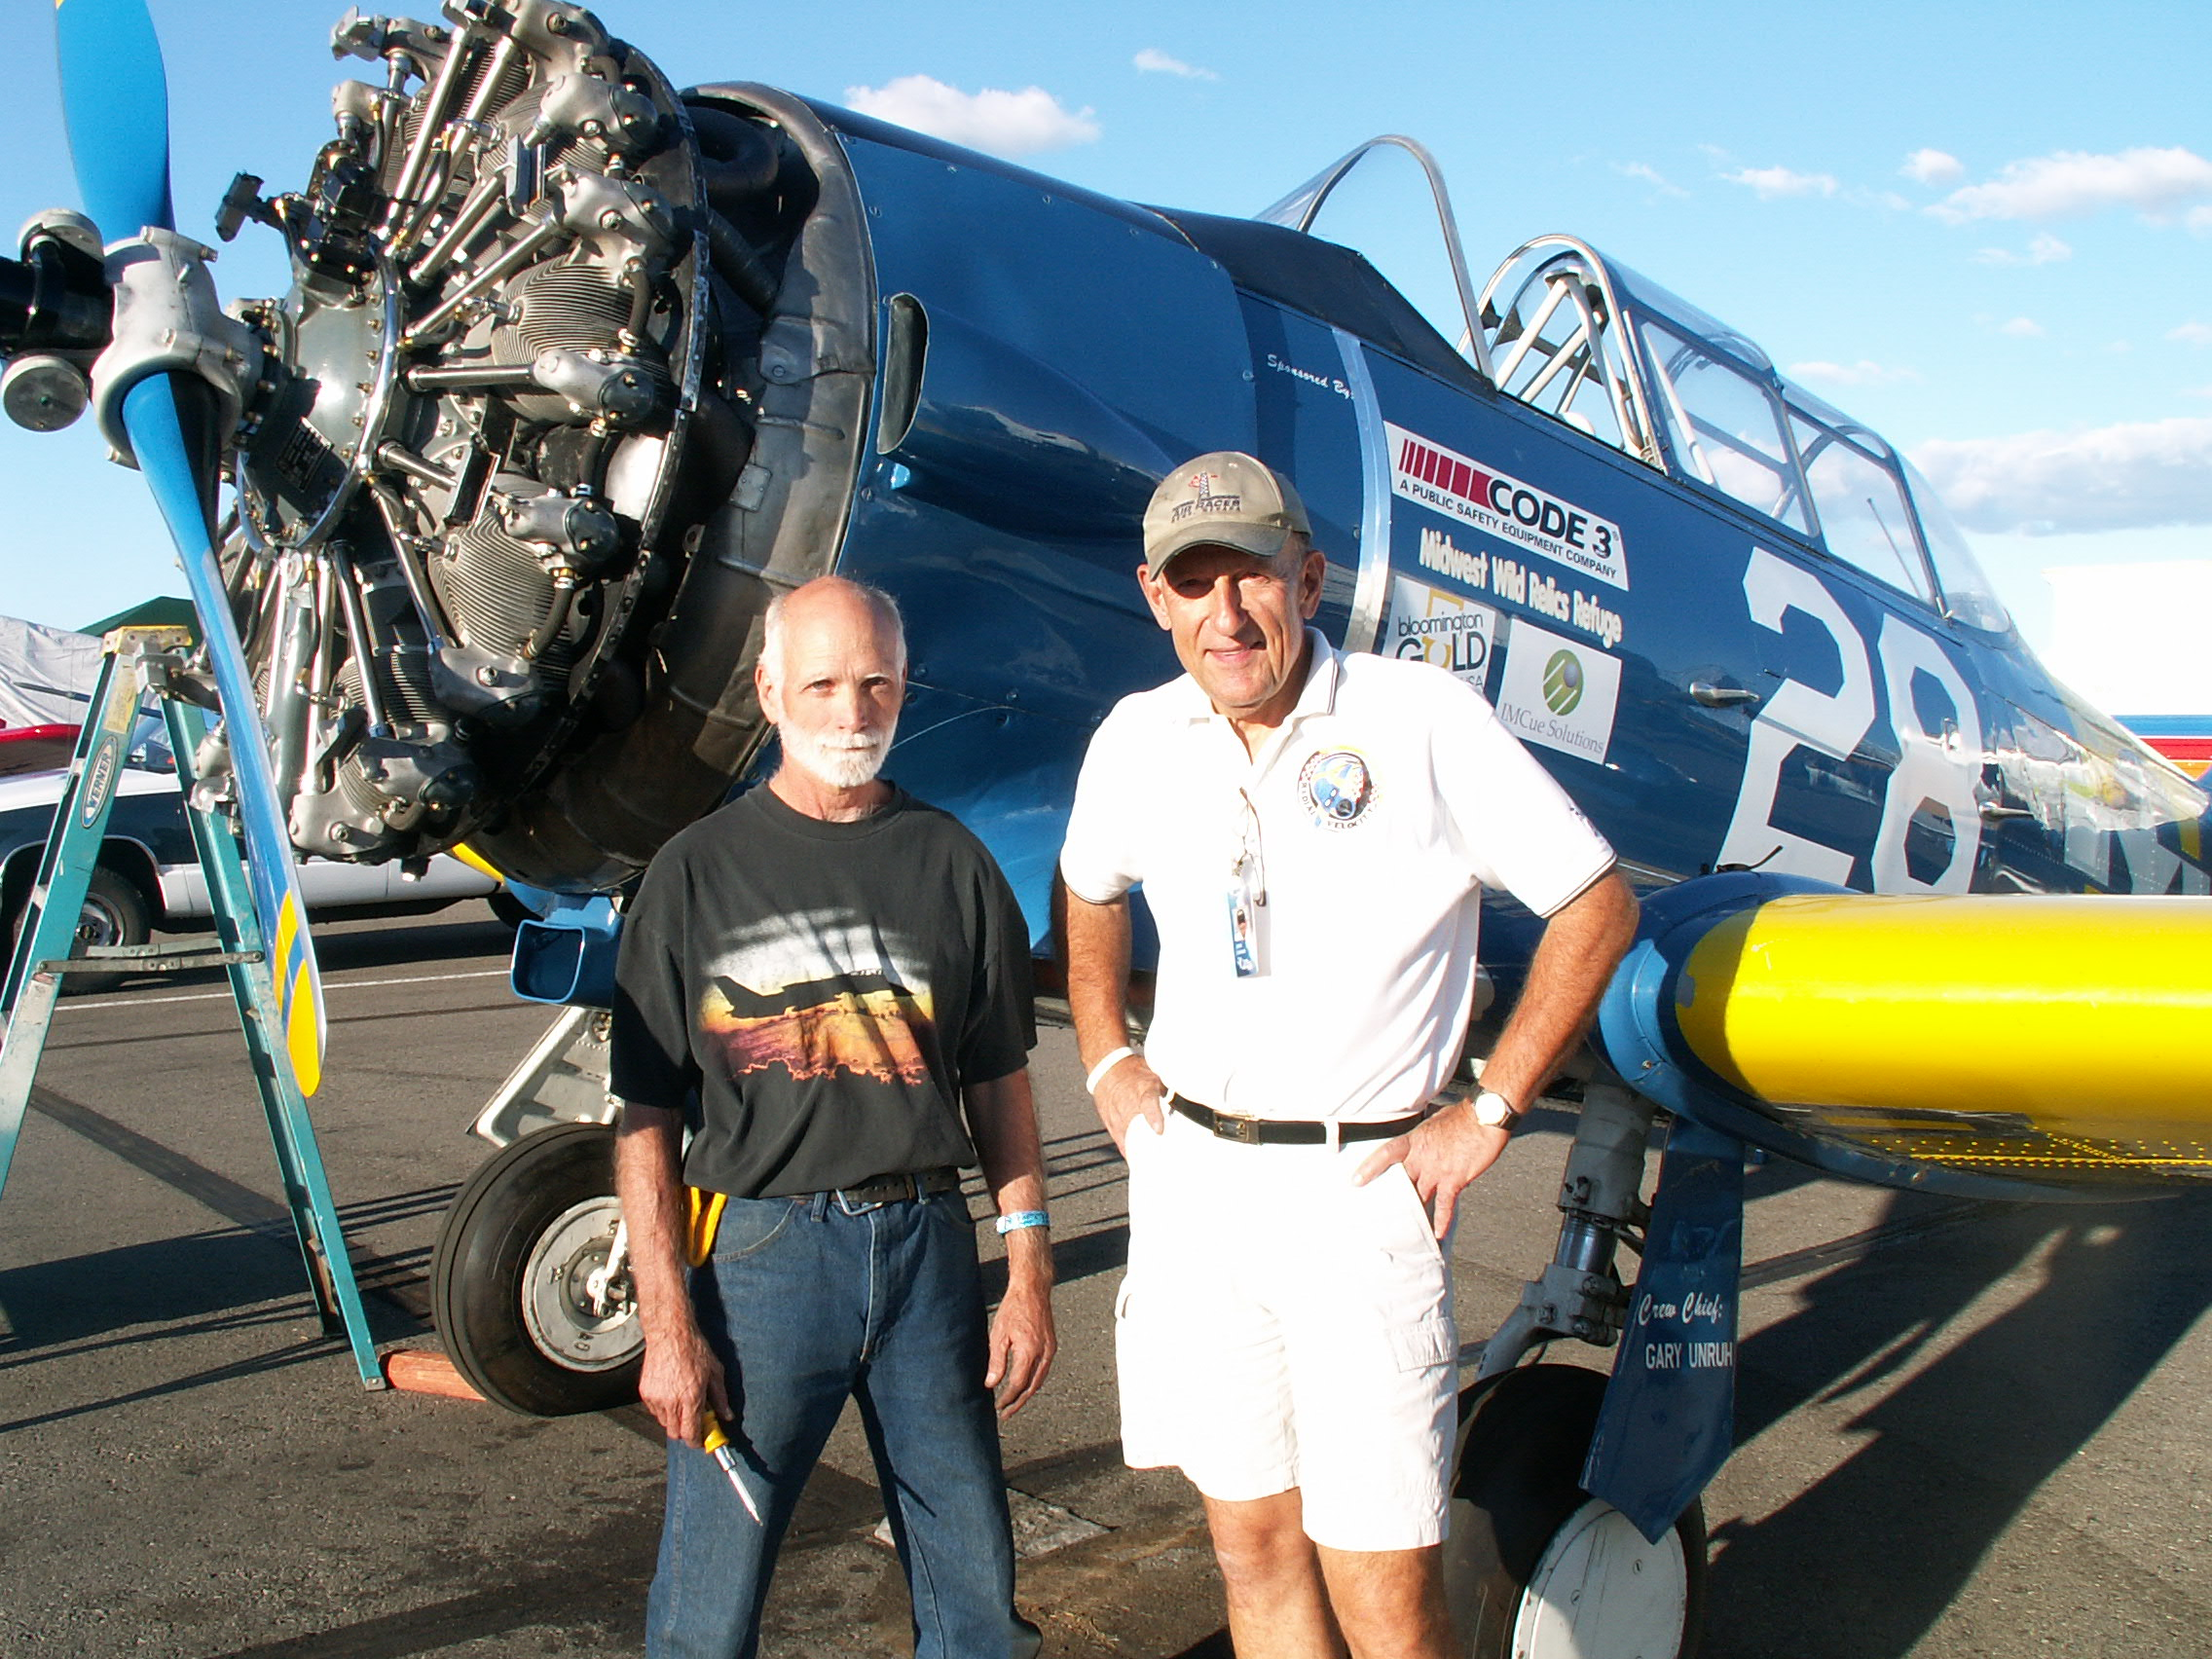 Crew Chief Gary Unruh & Owner/Pilot John Lohmar